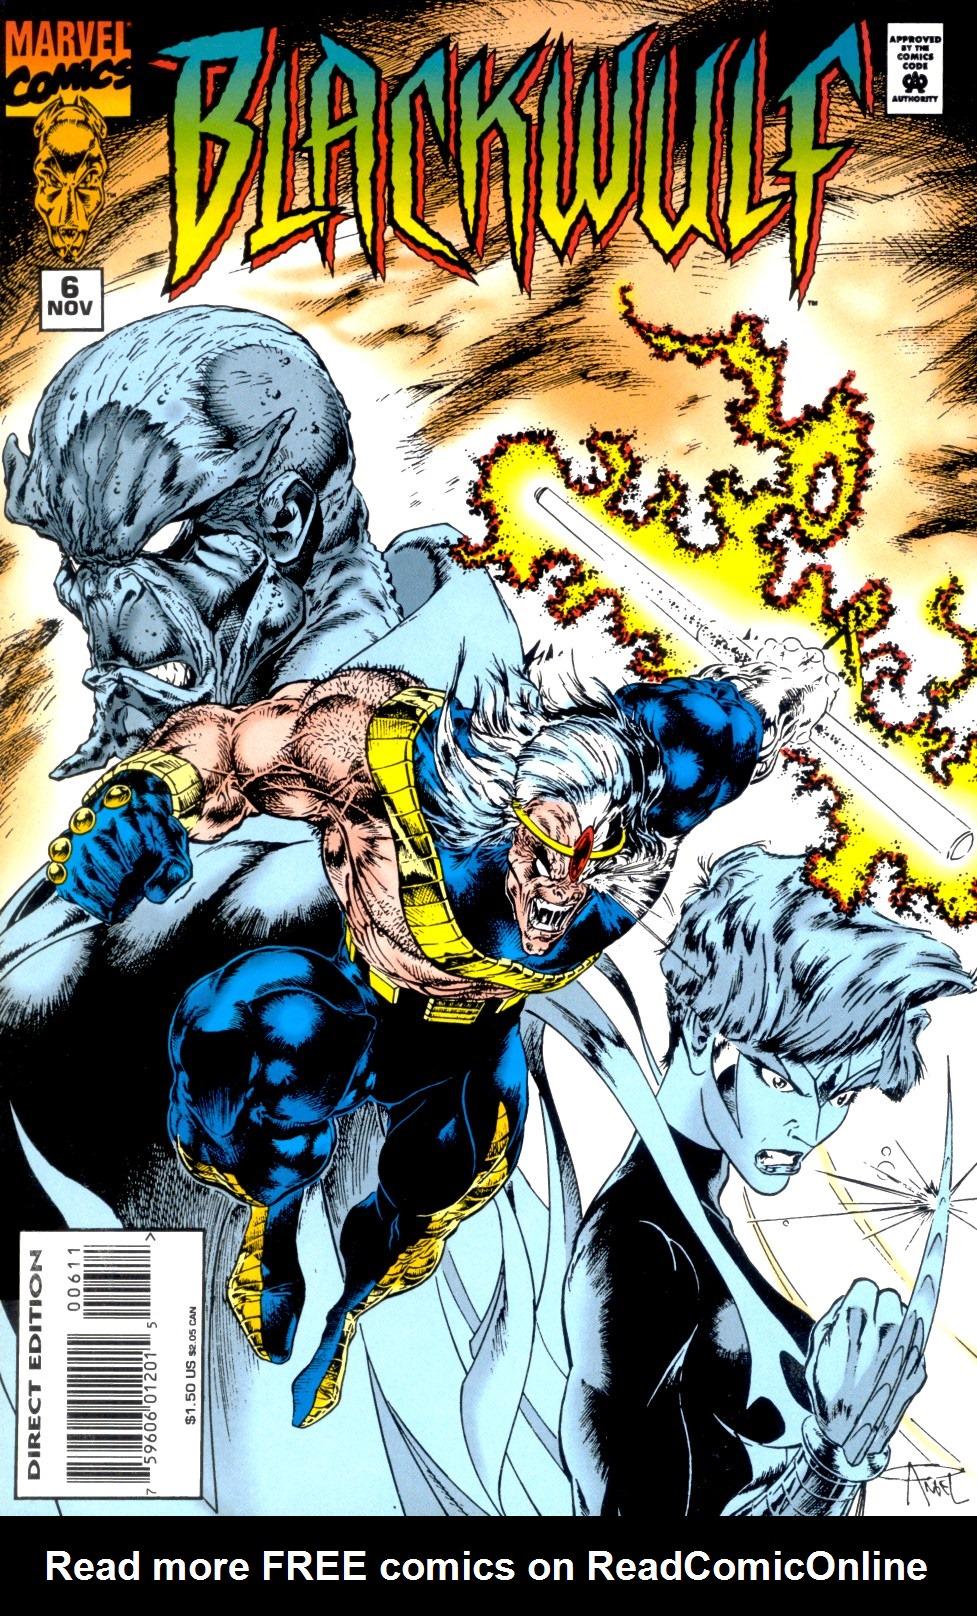 Read online Blackwulf comic -  Issue #6 - 1